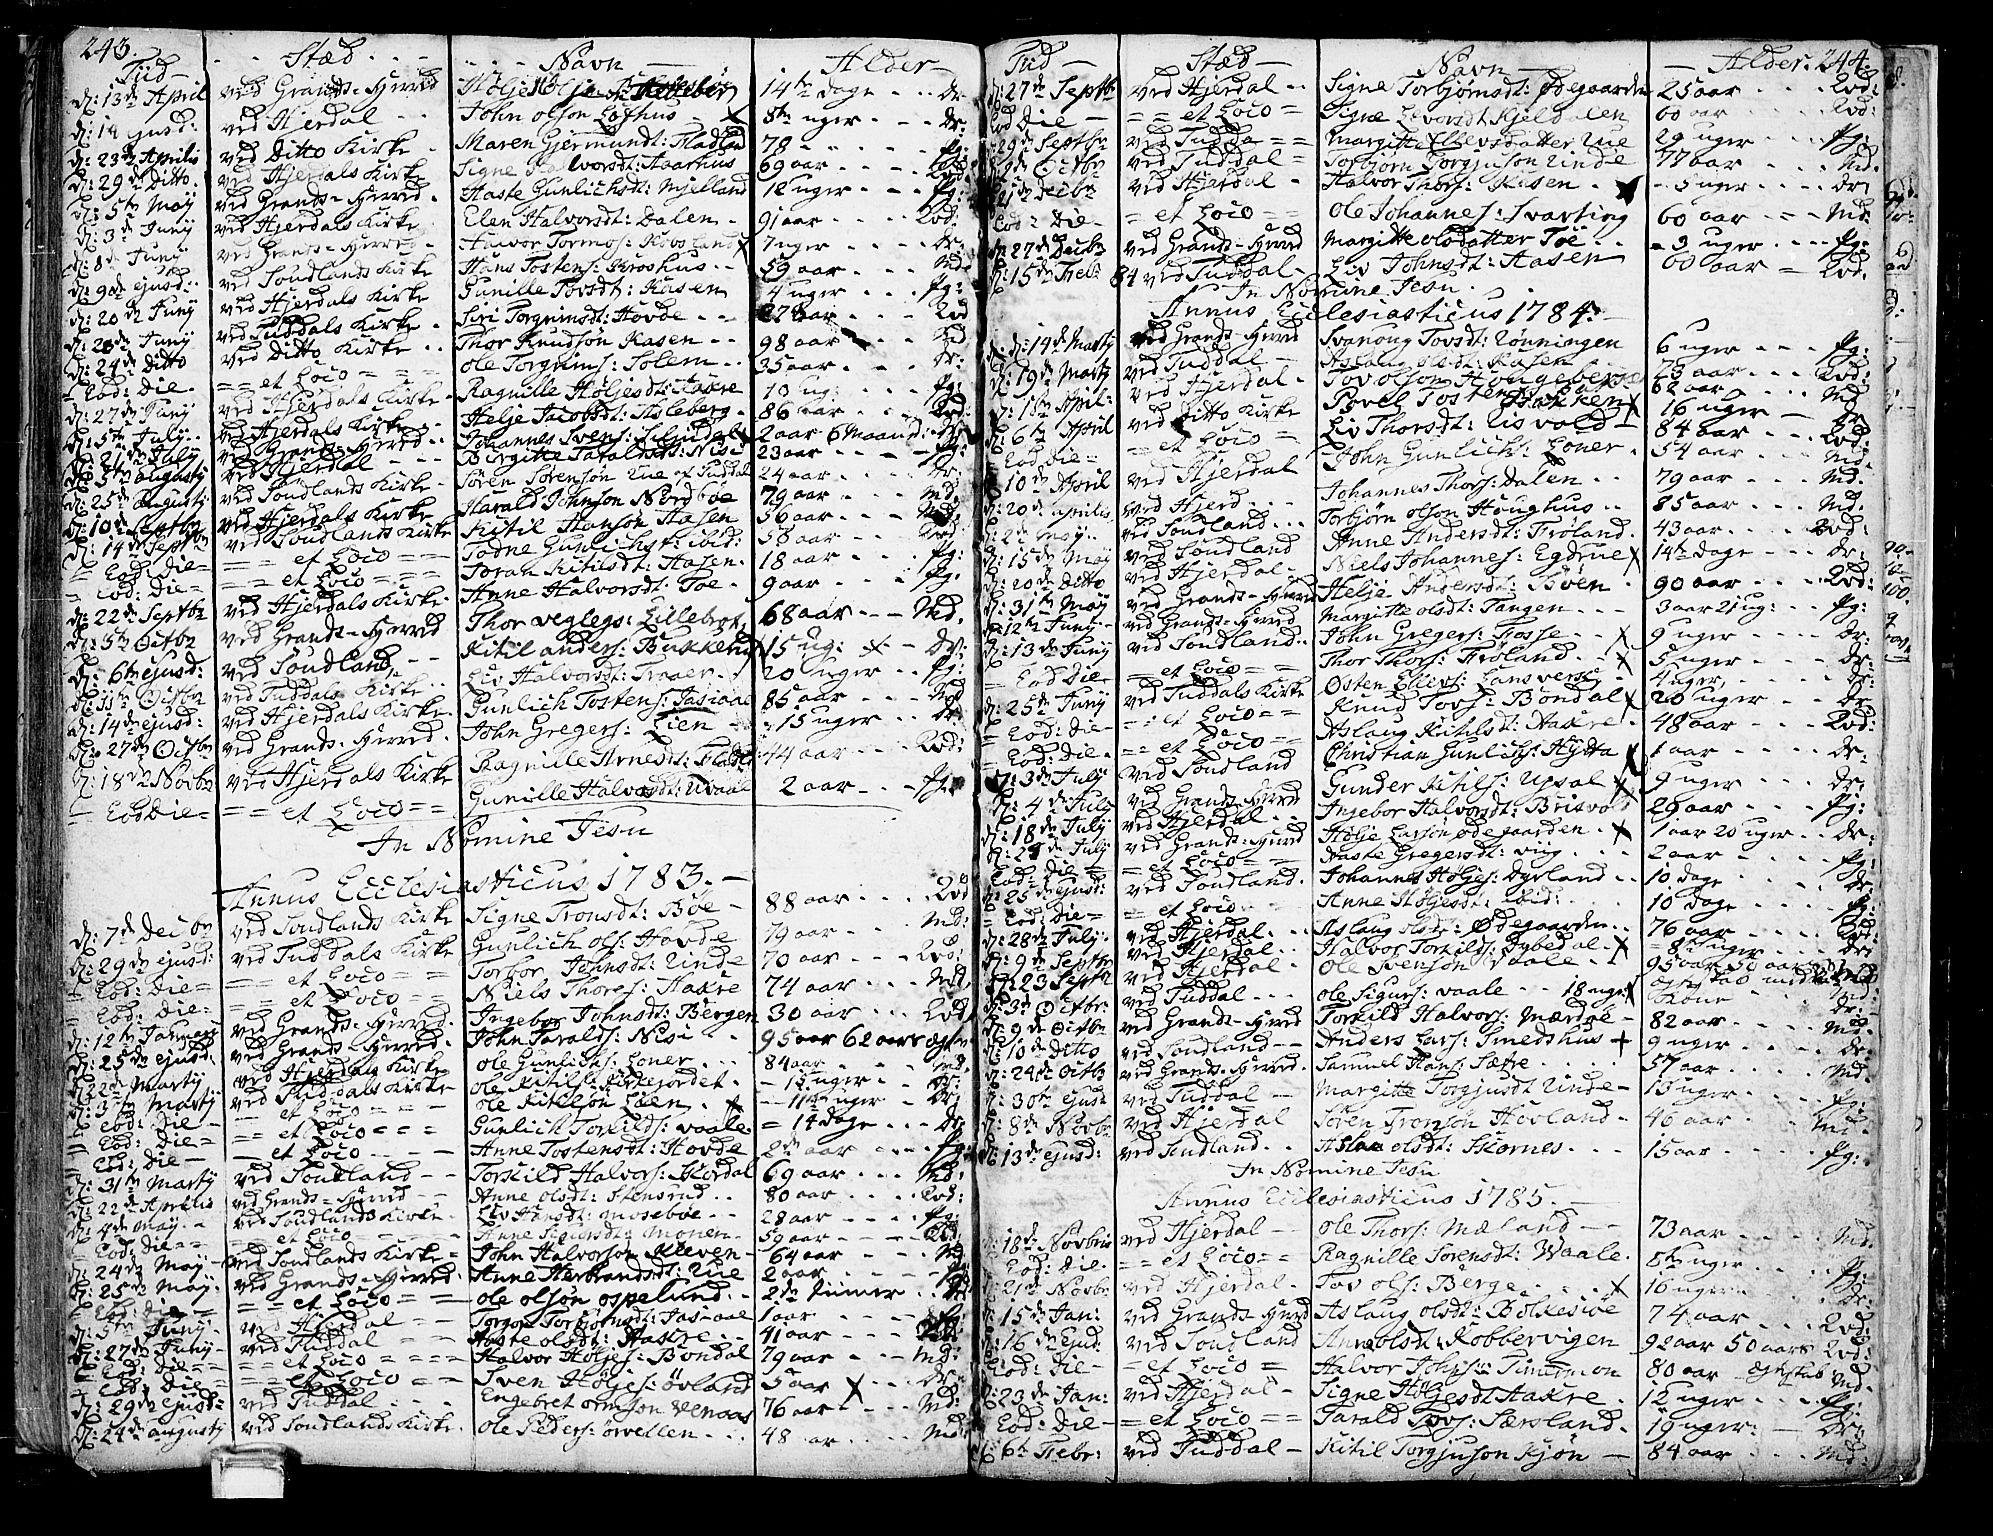 SAKO, Hjartdal kirkebøker, F/Fa/L0005: Ministerialbok nr. I 5, 1776-1801, s. 243-244